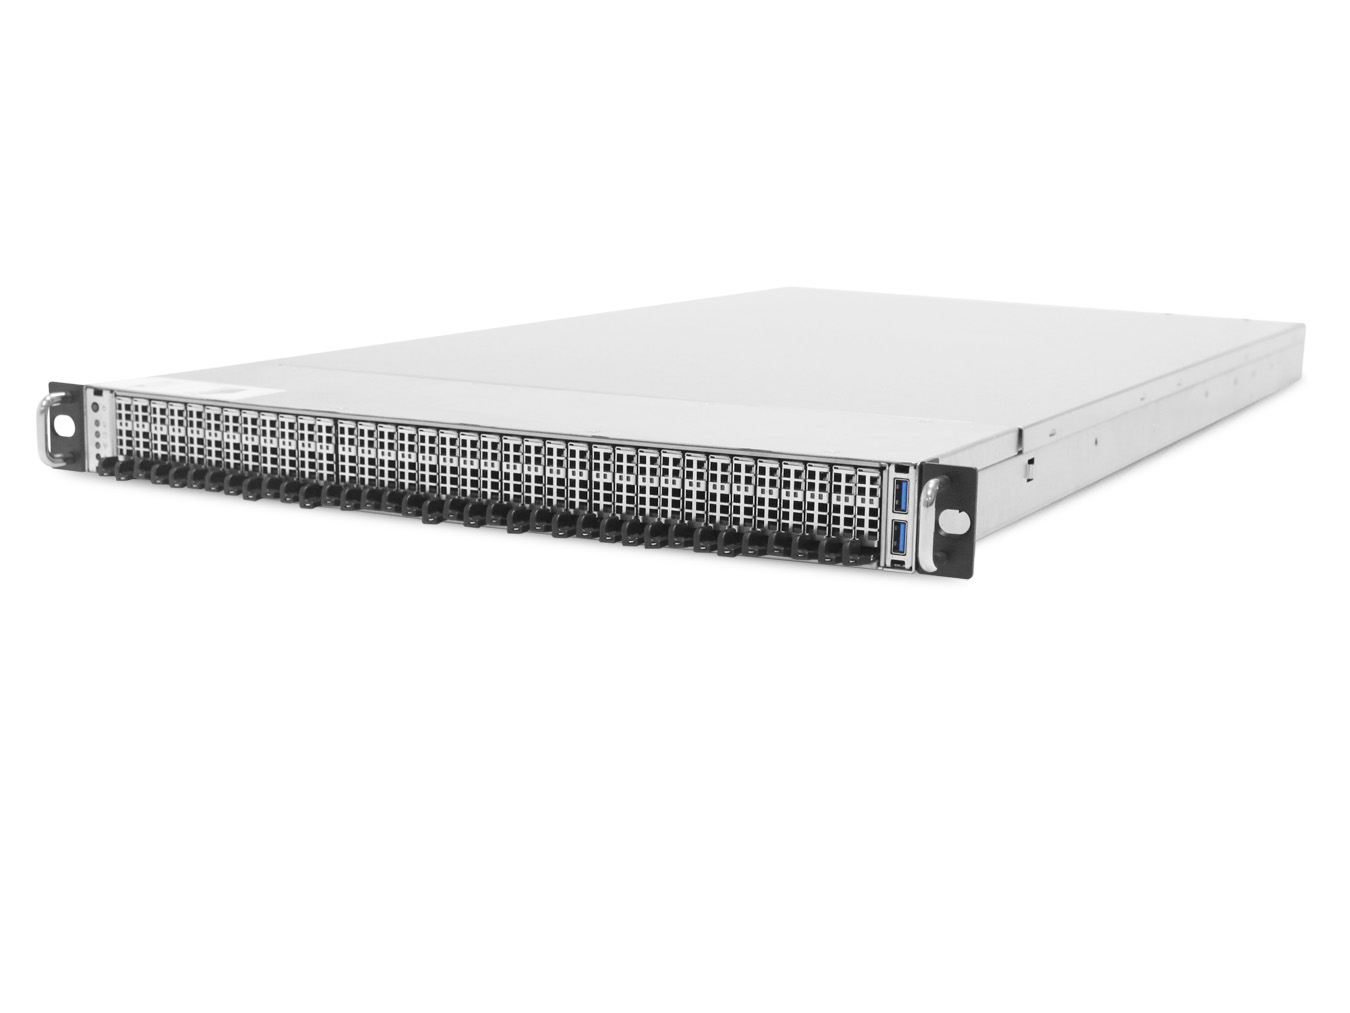 ServerDirect 1U Server, 36x M.3 NVME bays, 2x Intel Silver 4210, 2x 16GB, 1x 240GB SSD, 12x 8TB NVME Drives (96TB) , 2x GbE LAN, 2x 40/56Gb Infiniband, Redundant PSU